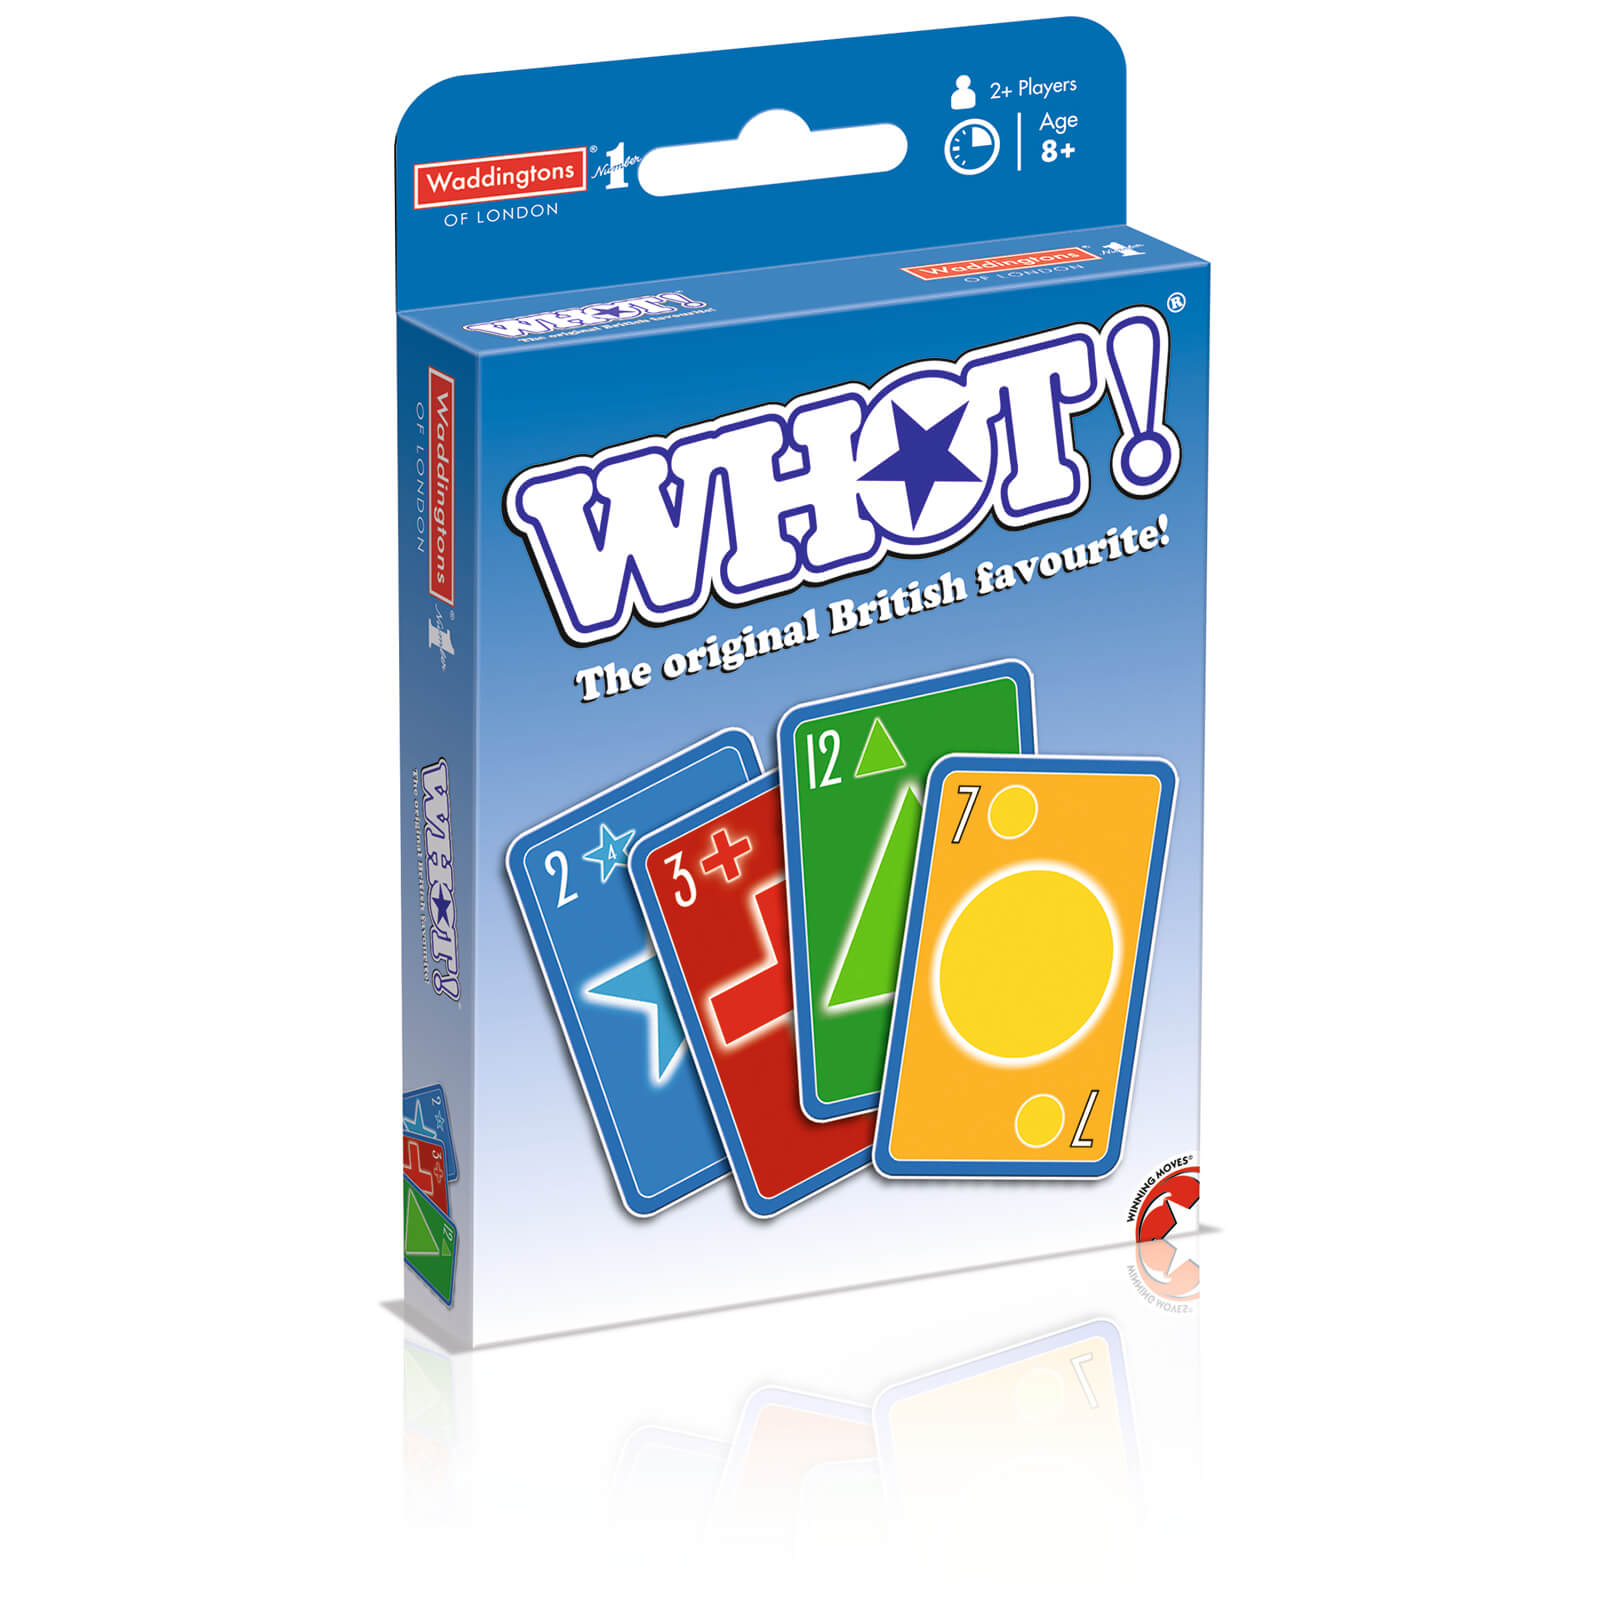 Image of WHOT! Travel Tuckbox Card Game - Original Edition